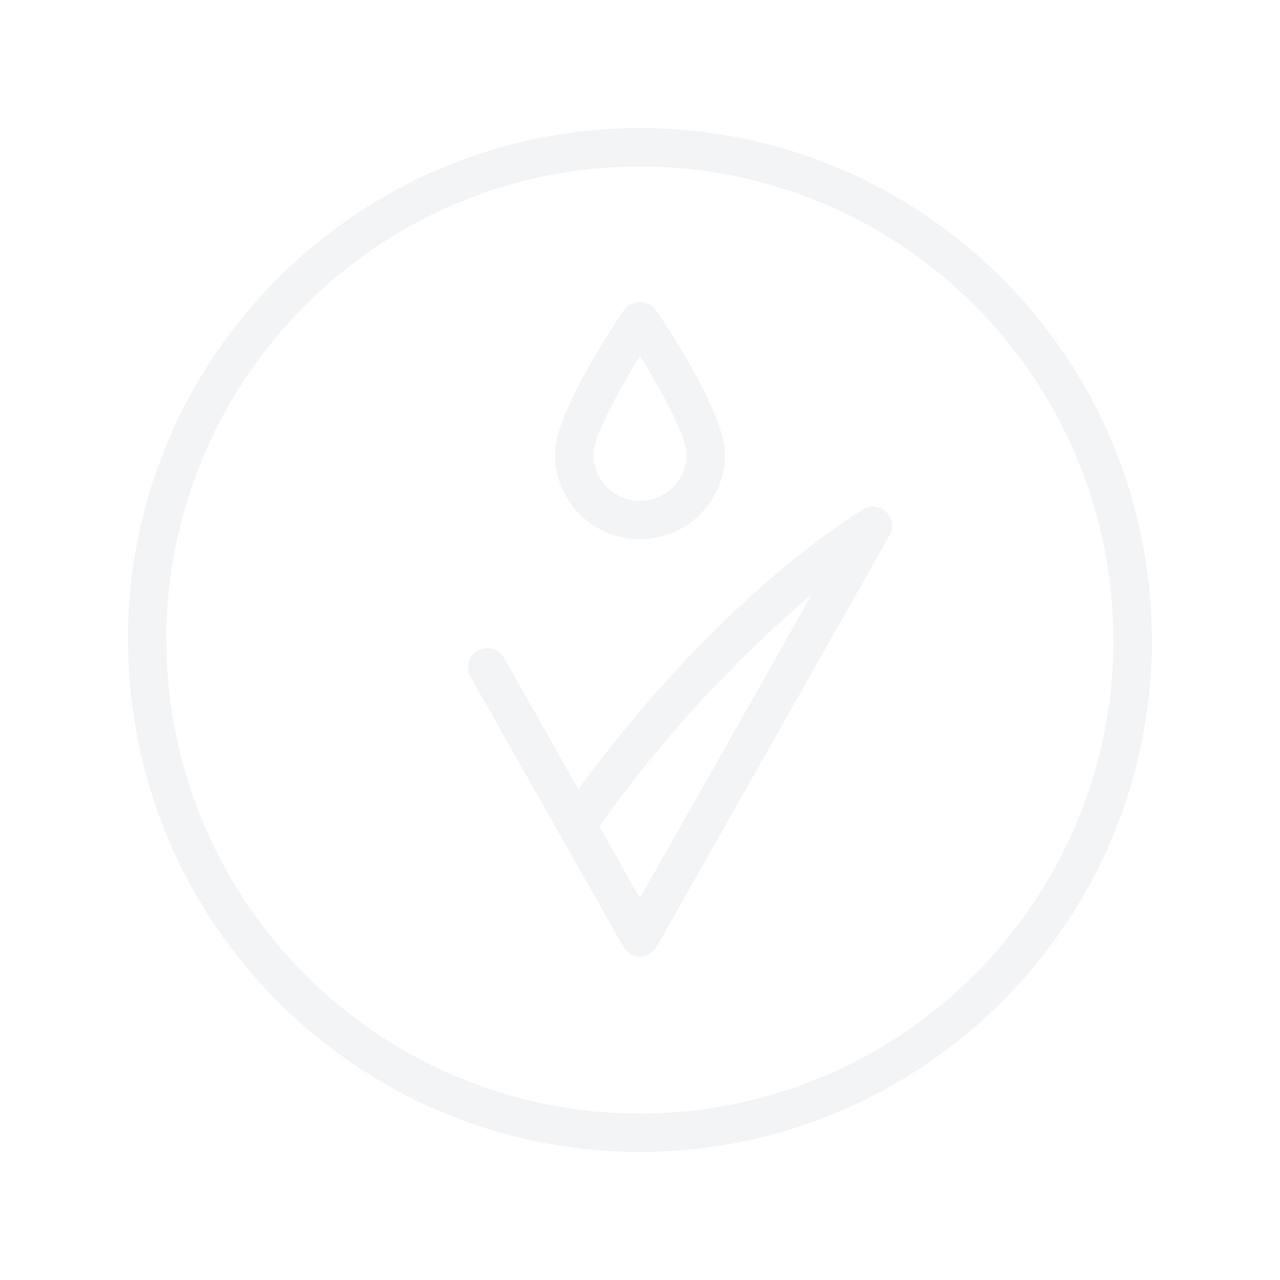 James Bond 007 After Shave Lotion 50ml